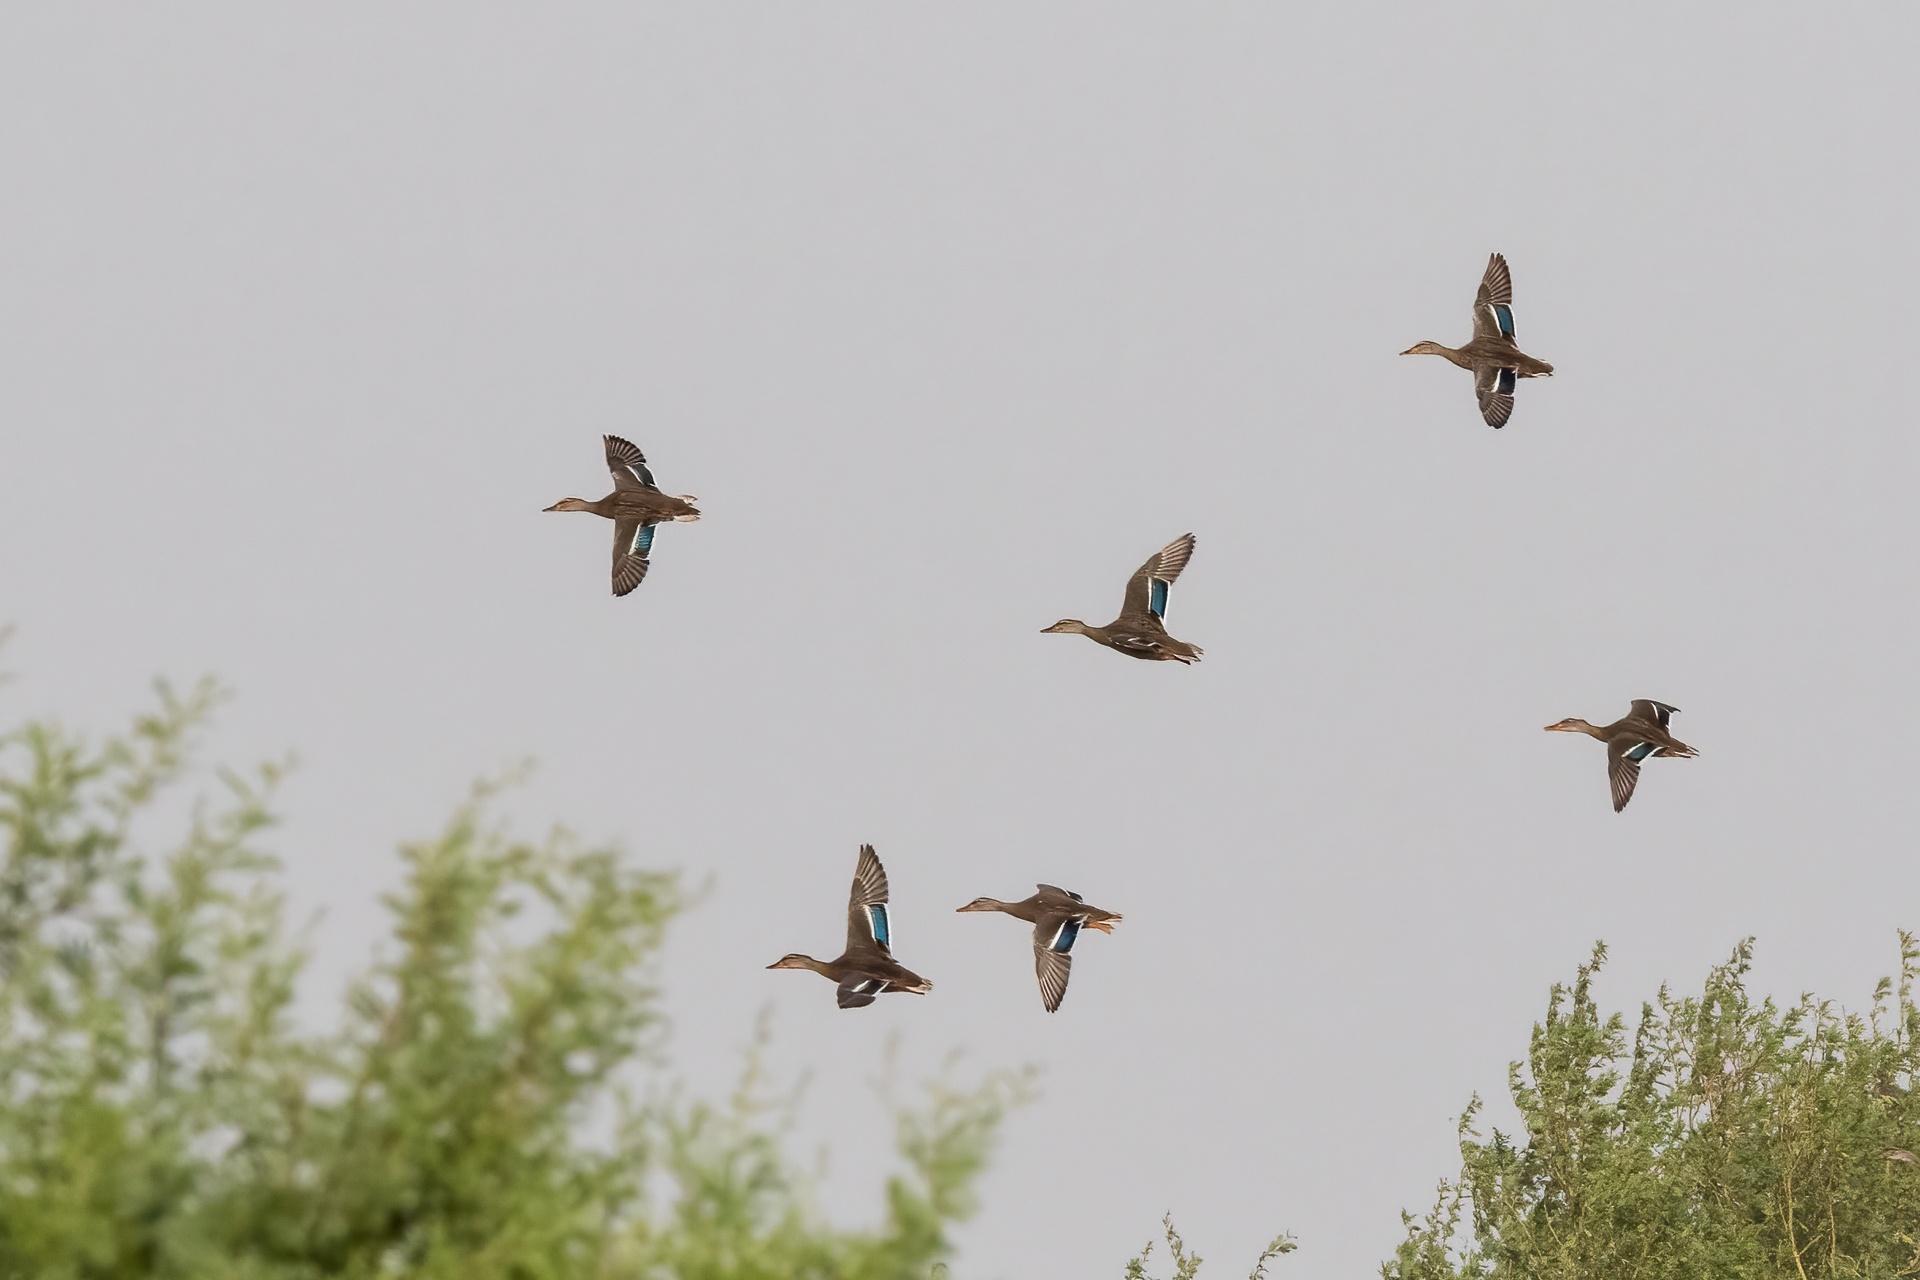 Mallard ducks in formation